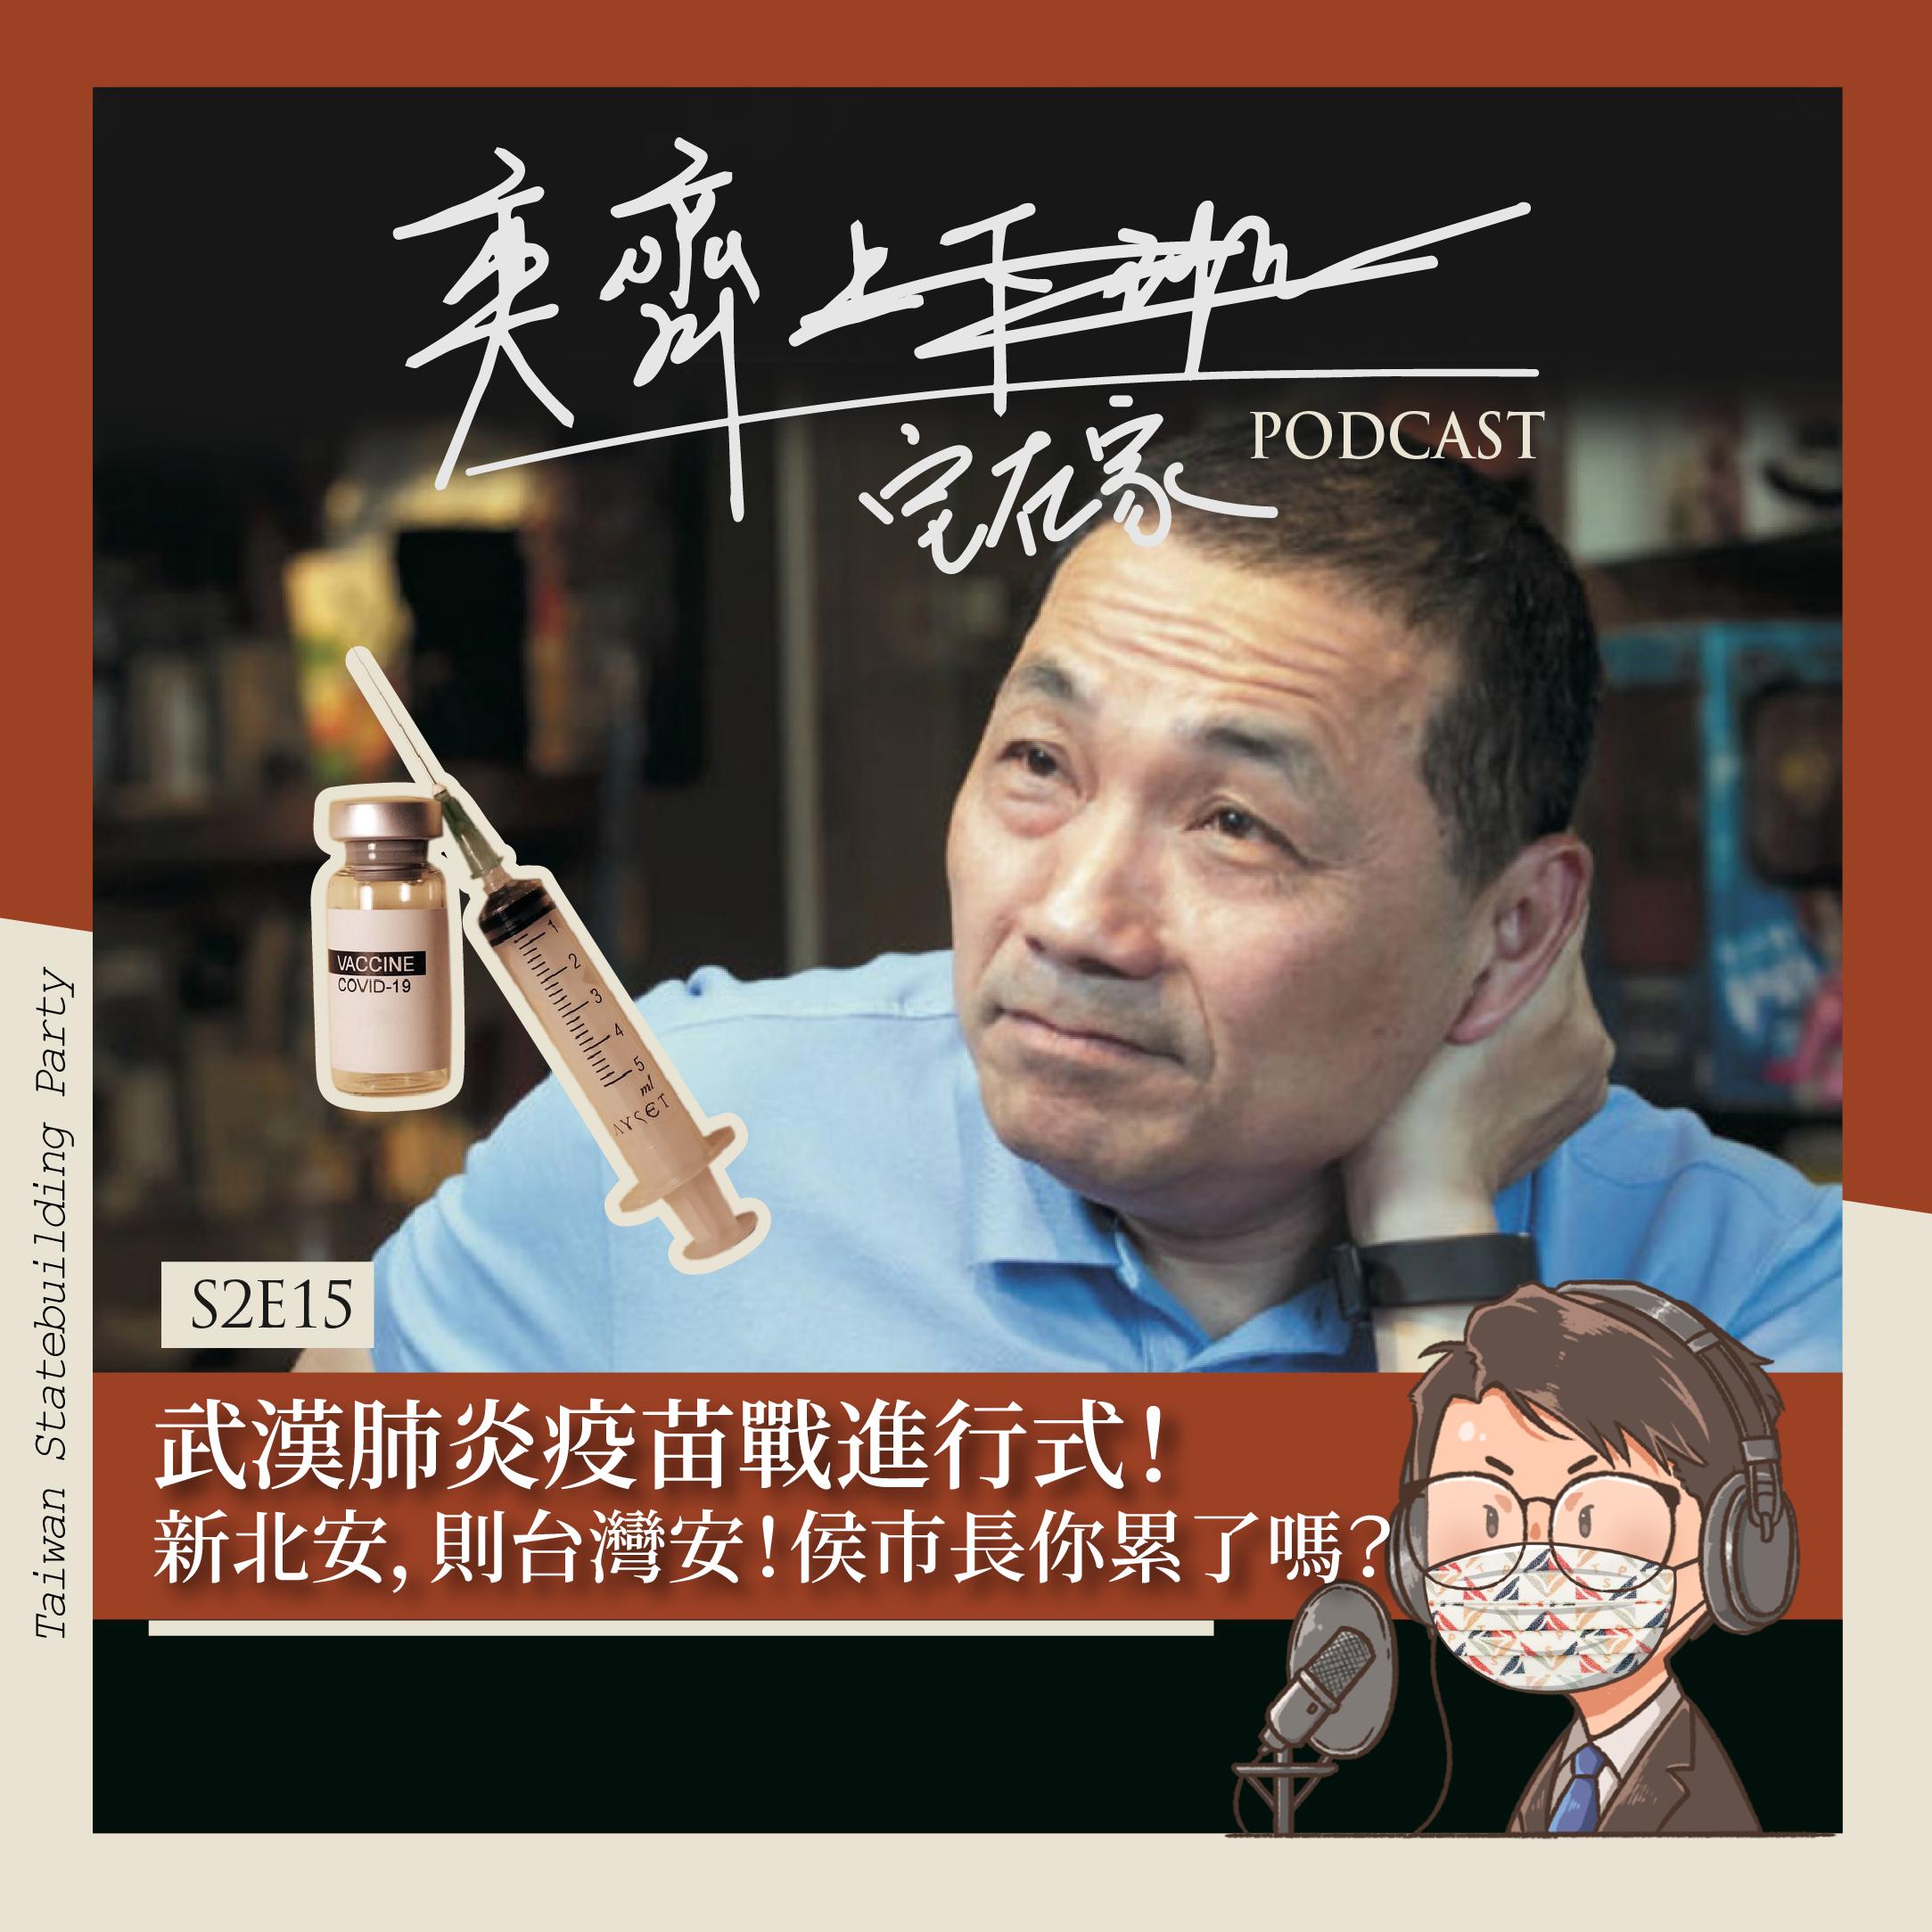 S2E15  武漢肺炎疫苗戰進行式! 新北安,則台灣安!侯市長你累了嗎?